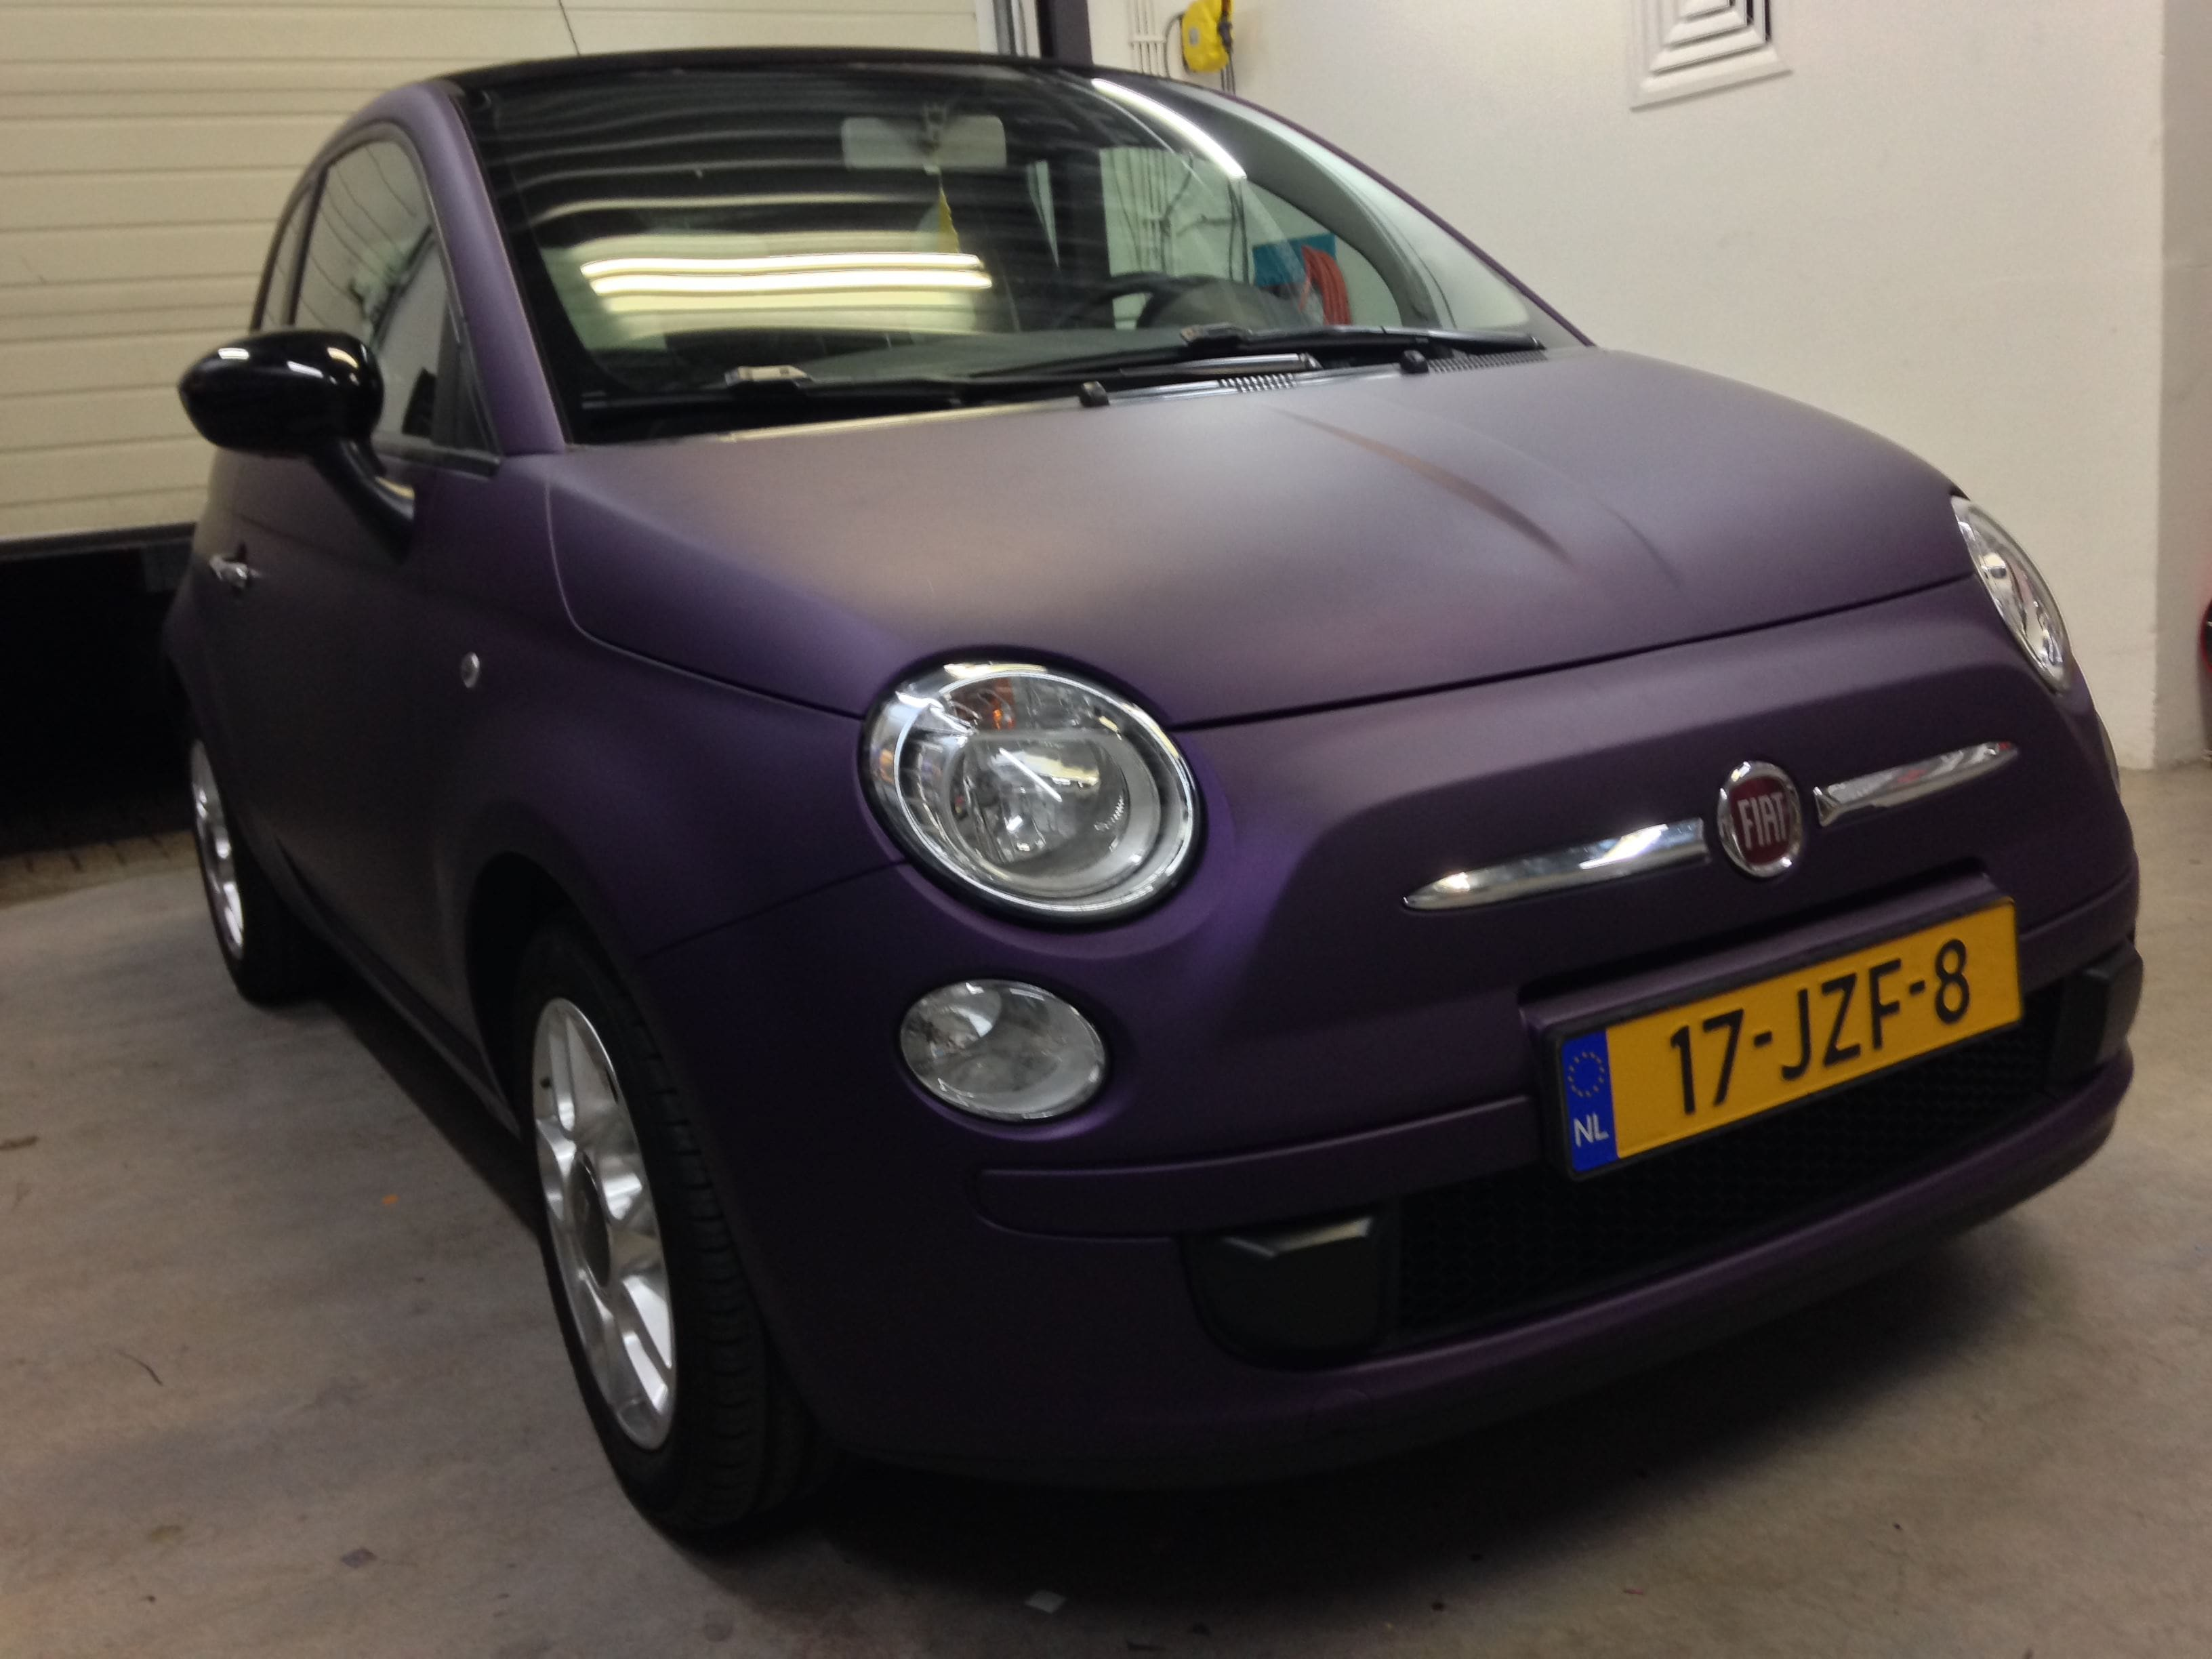 Fiat 500 met Cyber Grape Wrap, Carwrapping door Wrapmyride.nu Foto-nr:5720, ©2020